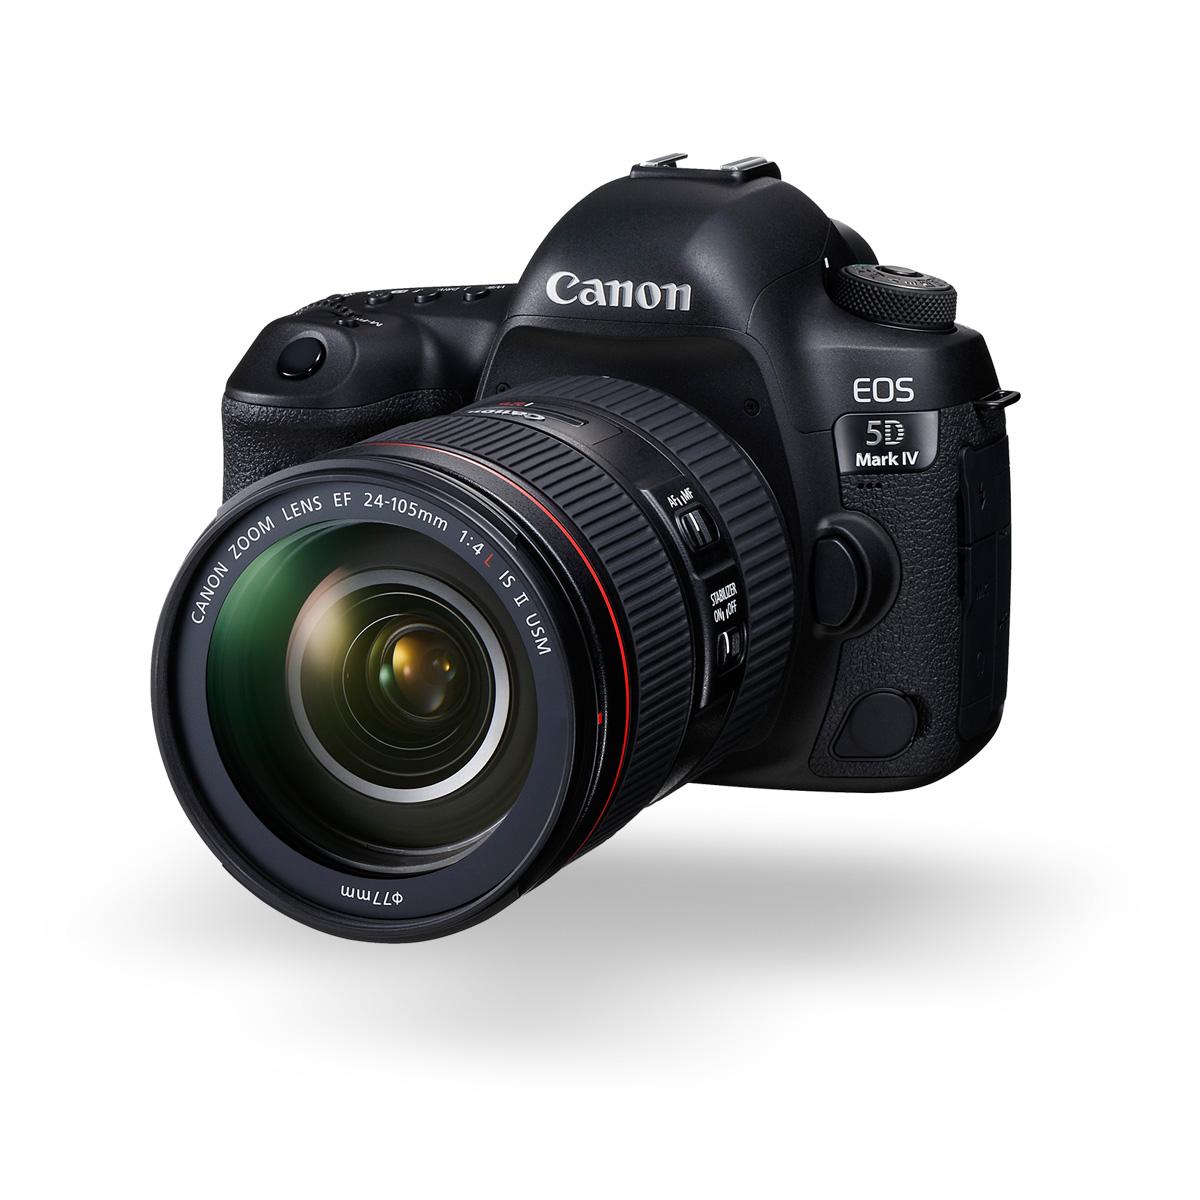 EOS 5D Mark IV | Canon New Zealand